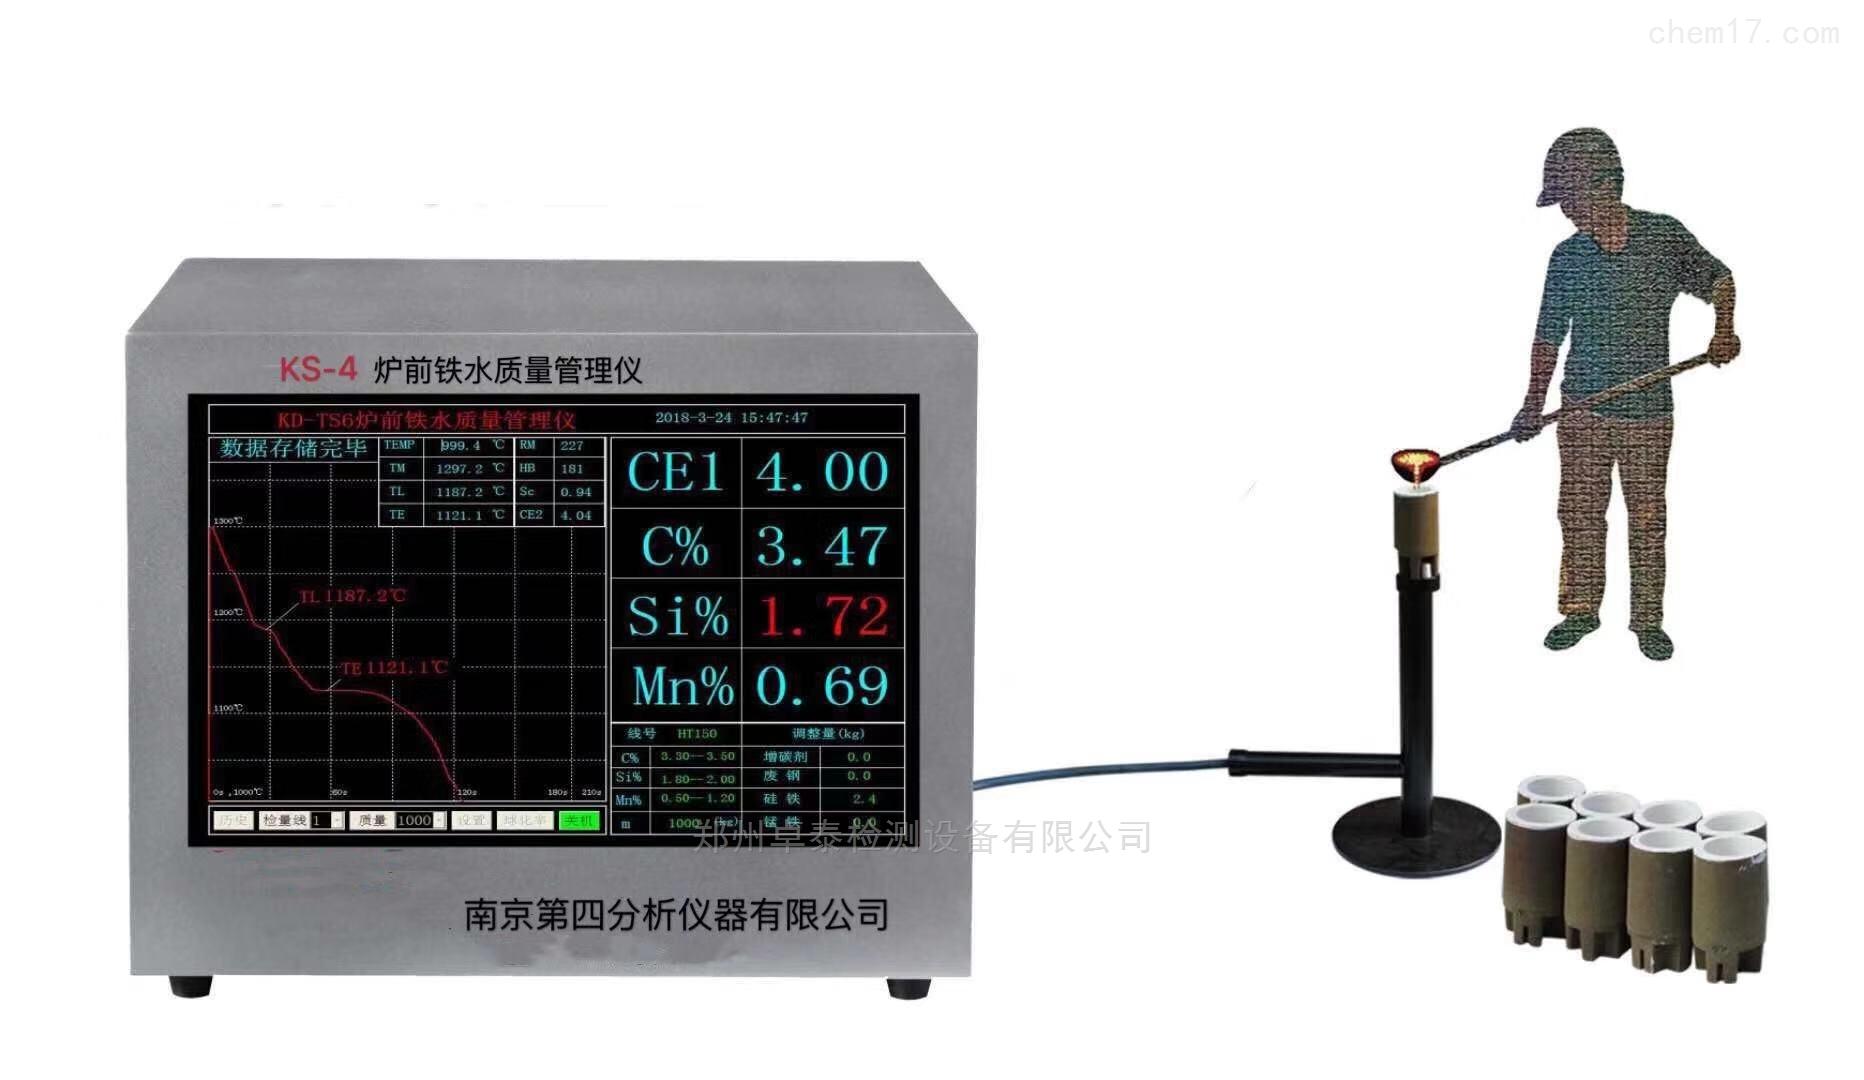 KS-4郑州炉前铁水碳硅质量分析仪